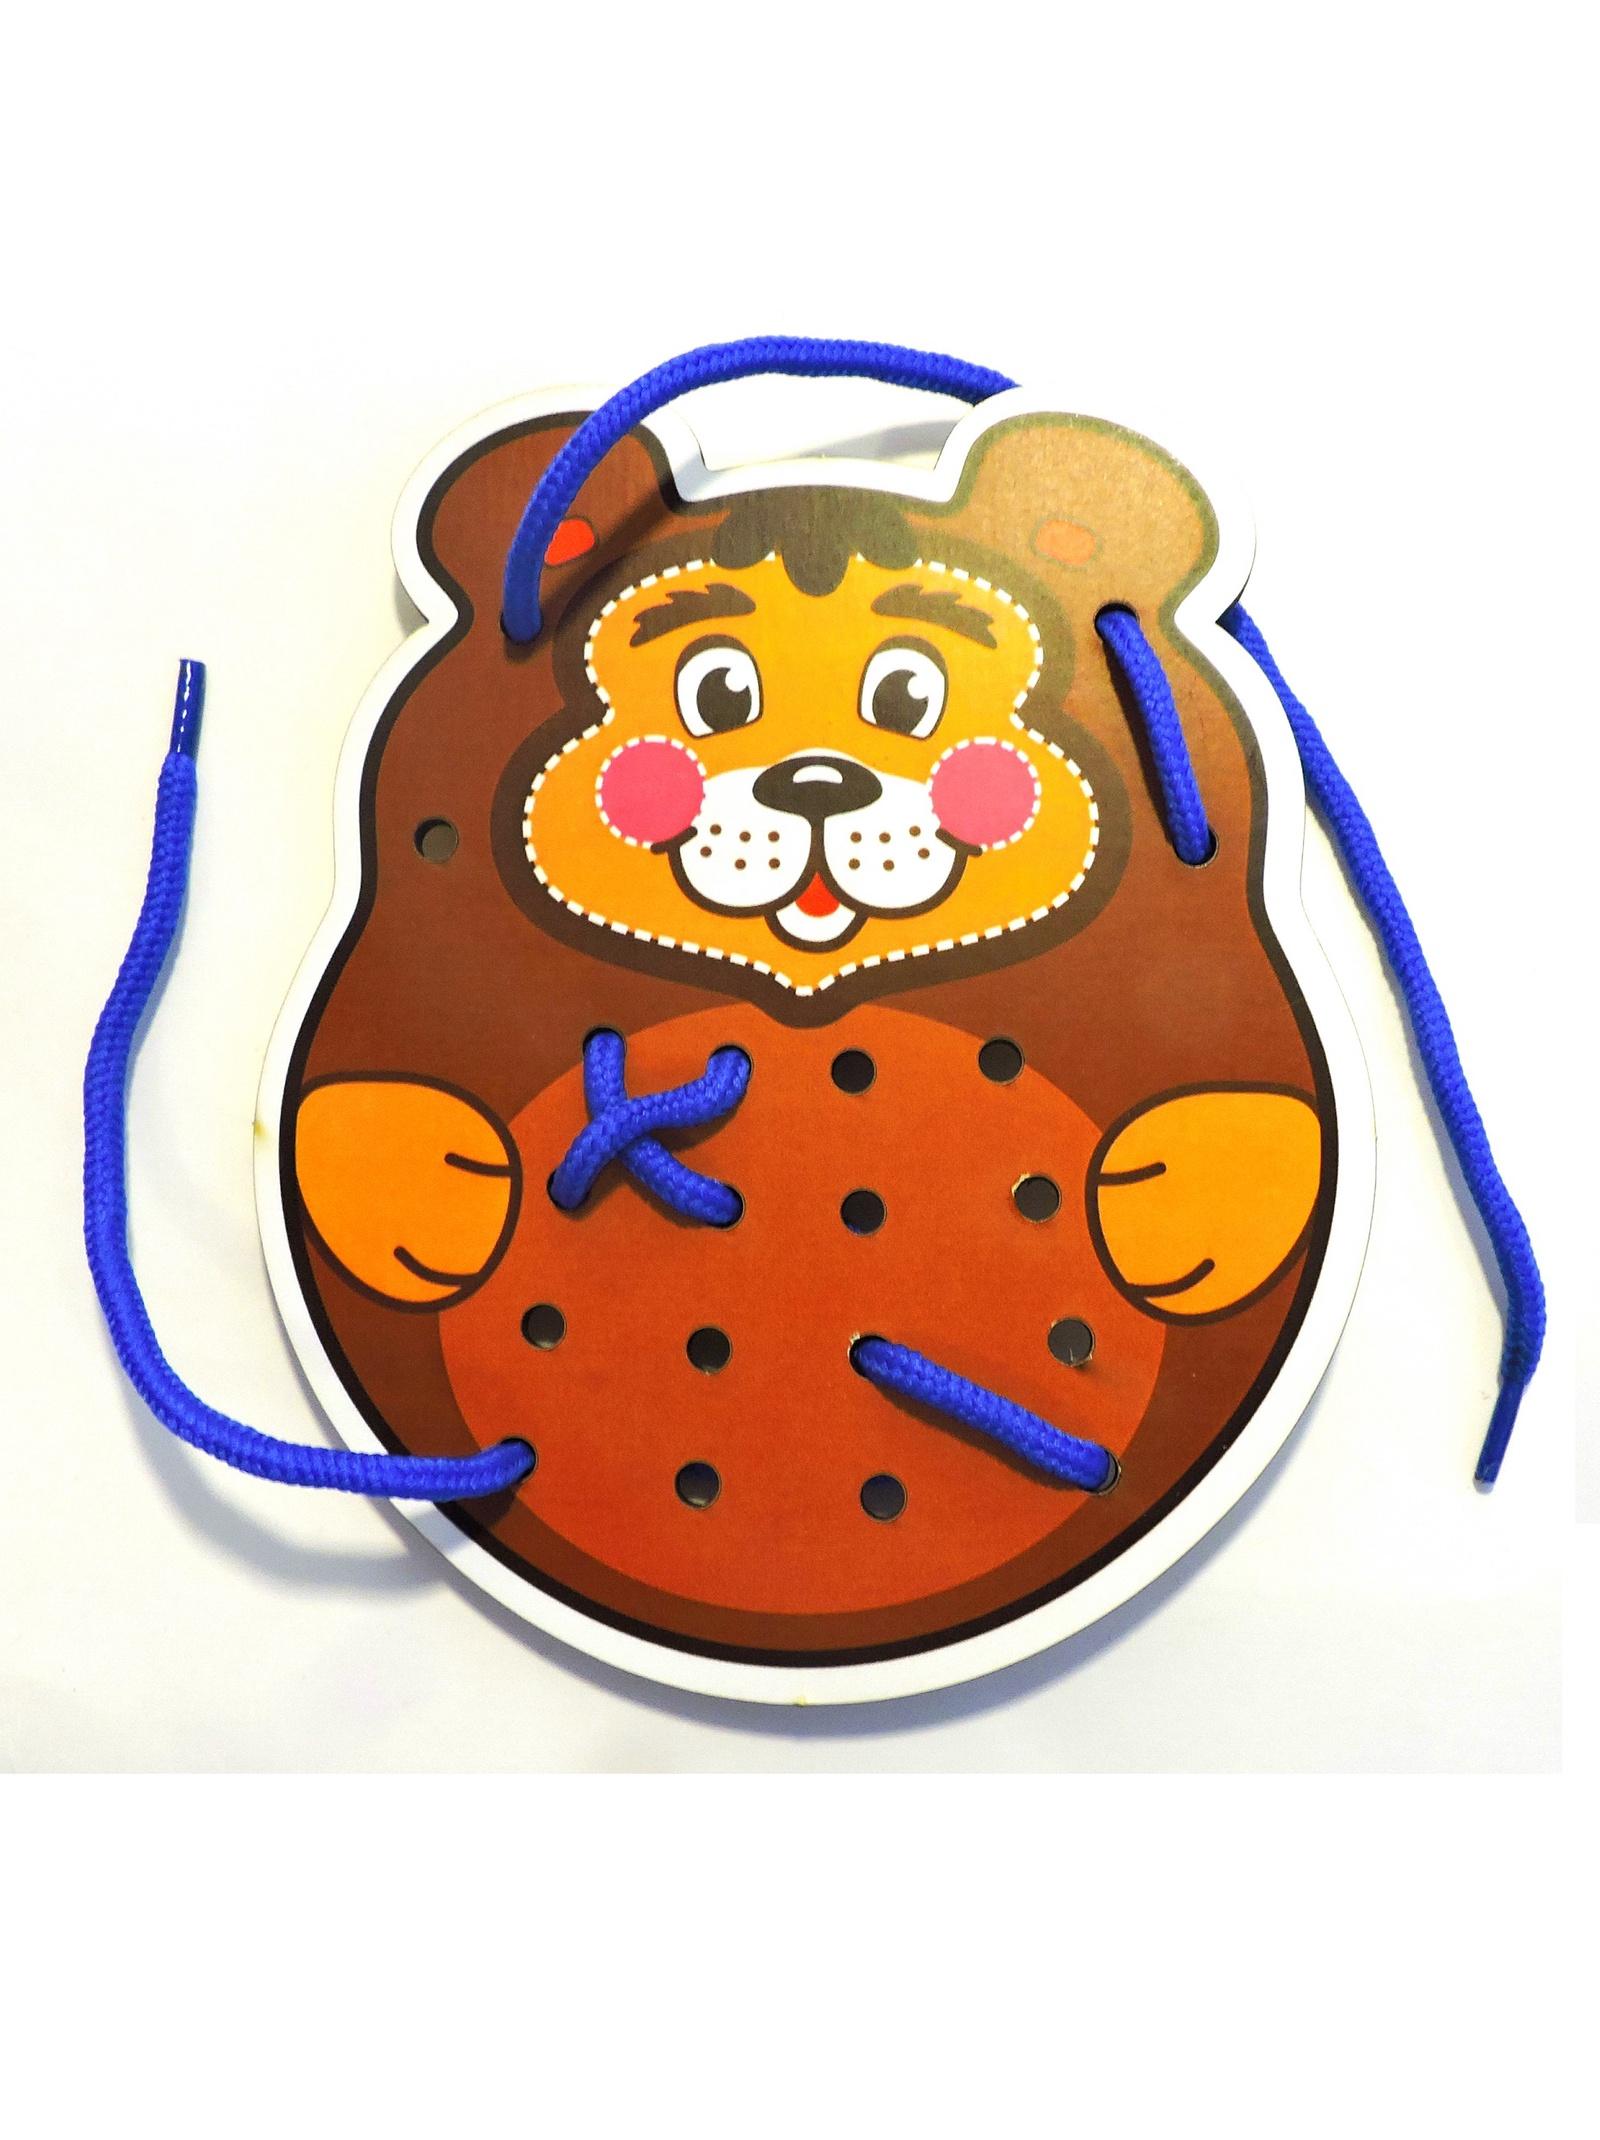 Шнуровка Taowa цветная Медведь коричневый